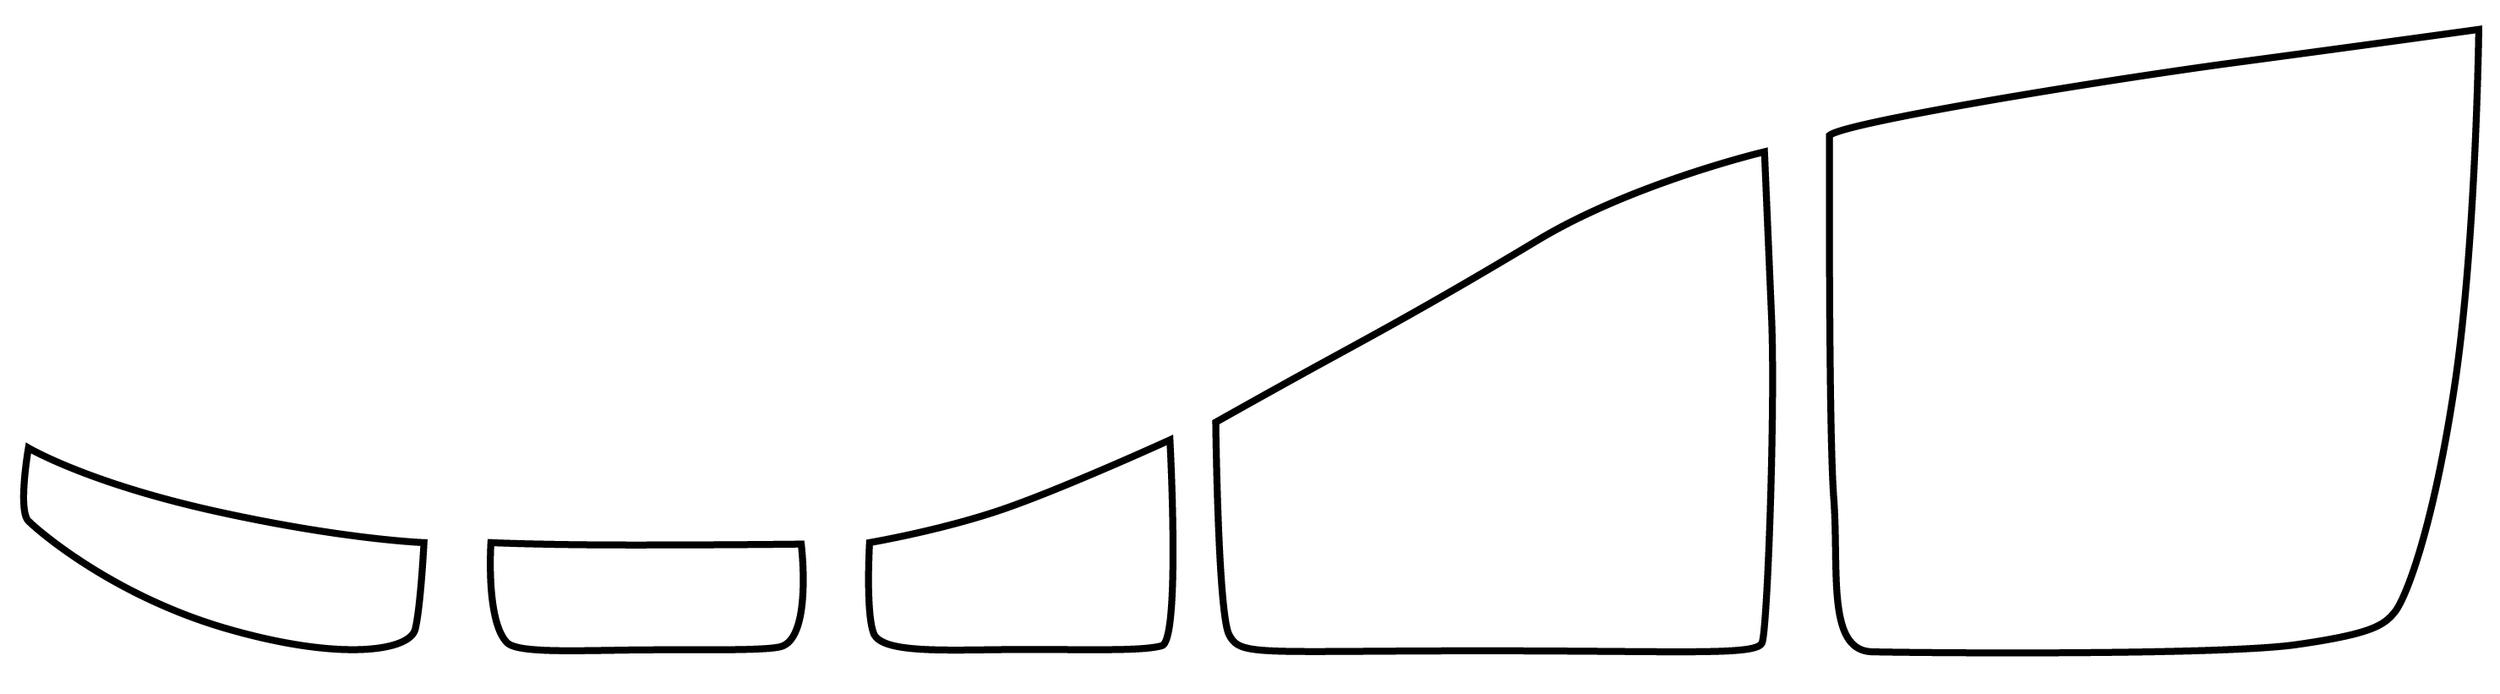 wedge profile